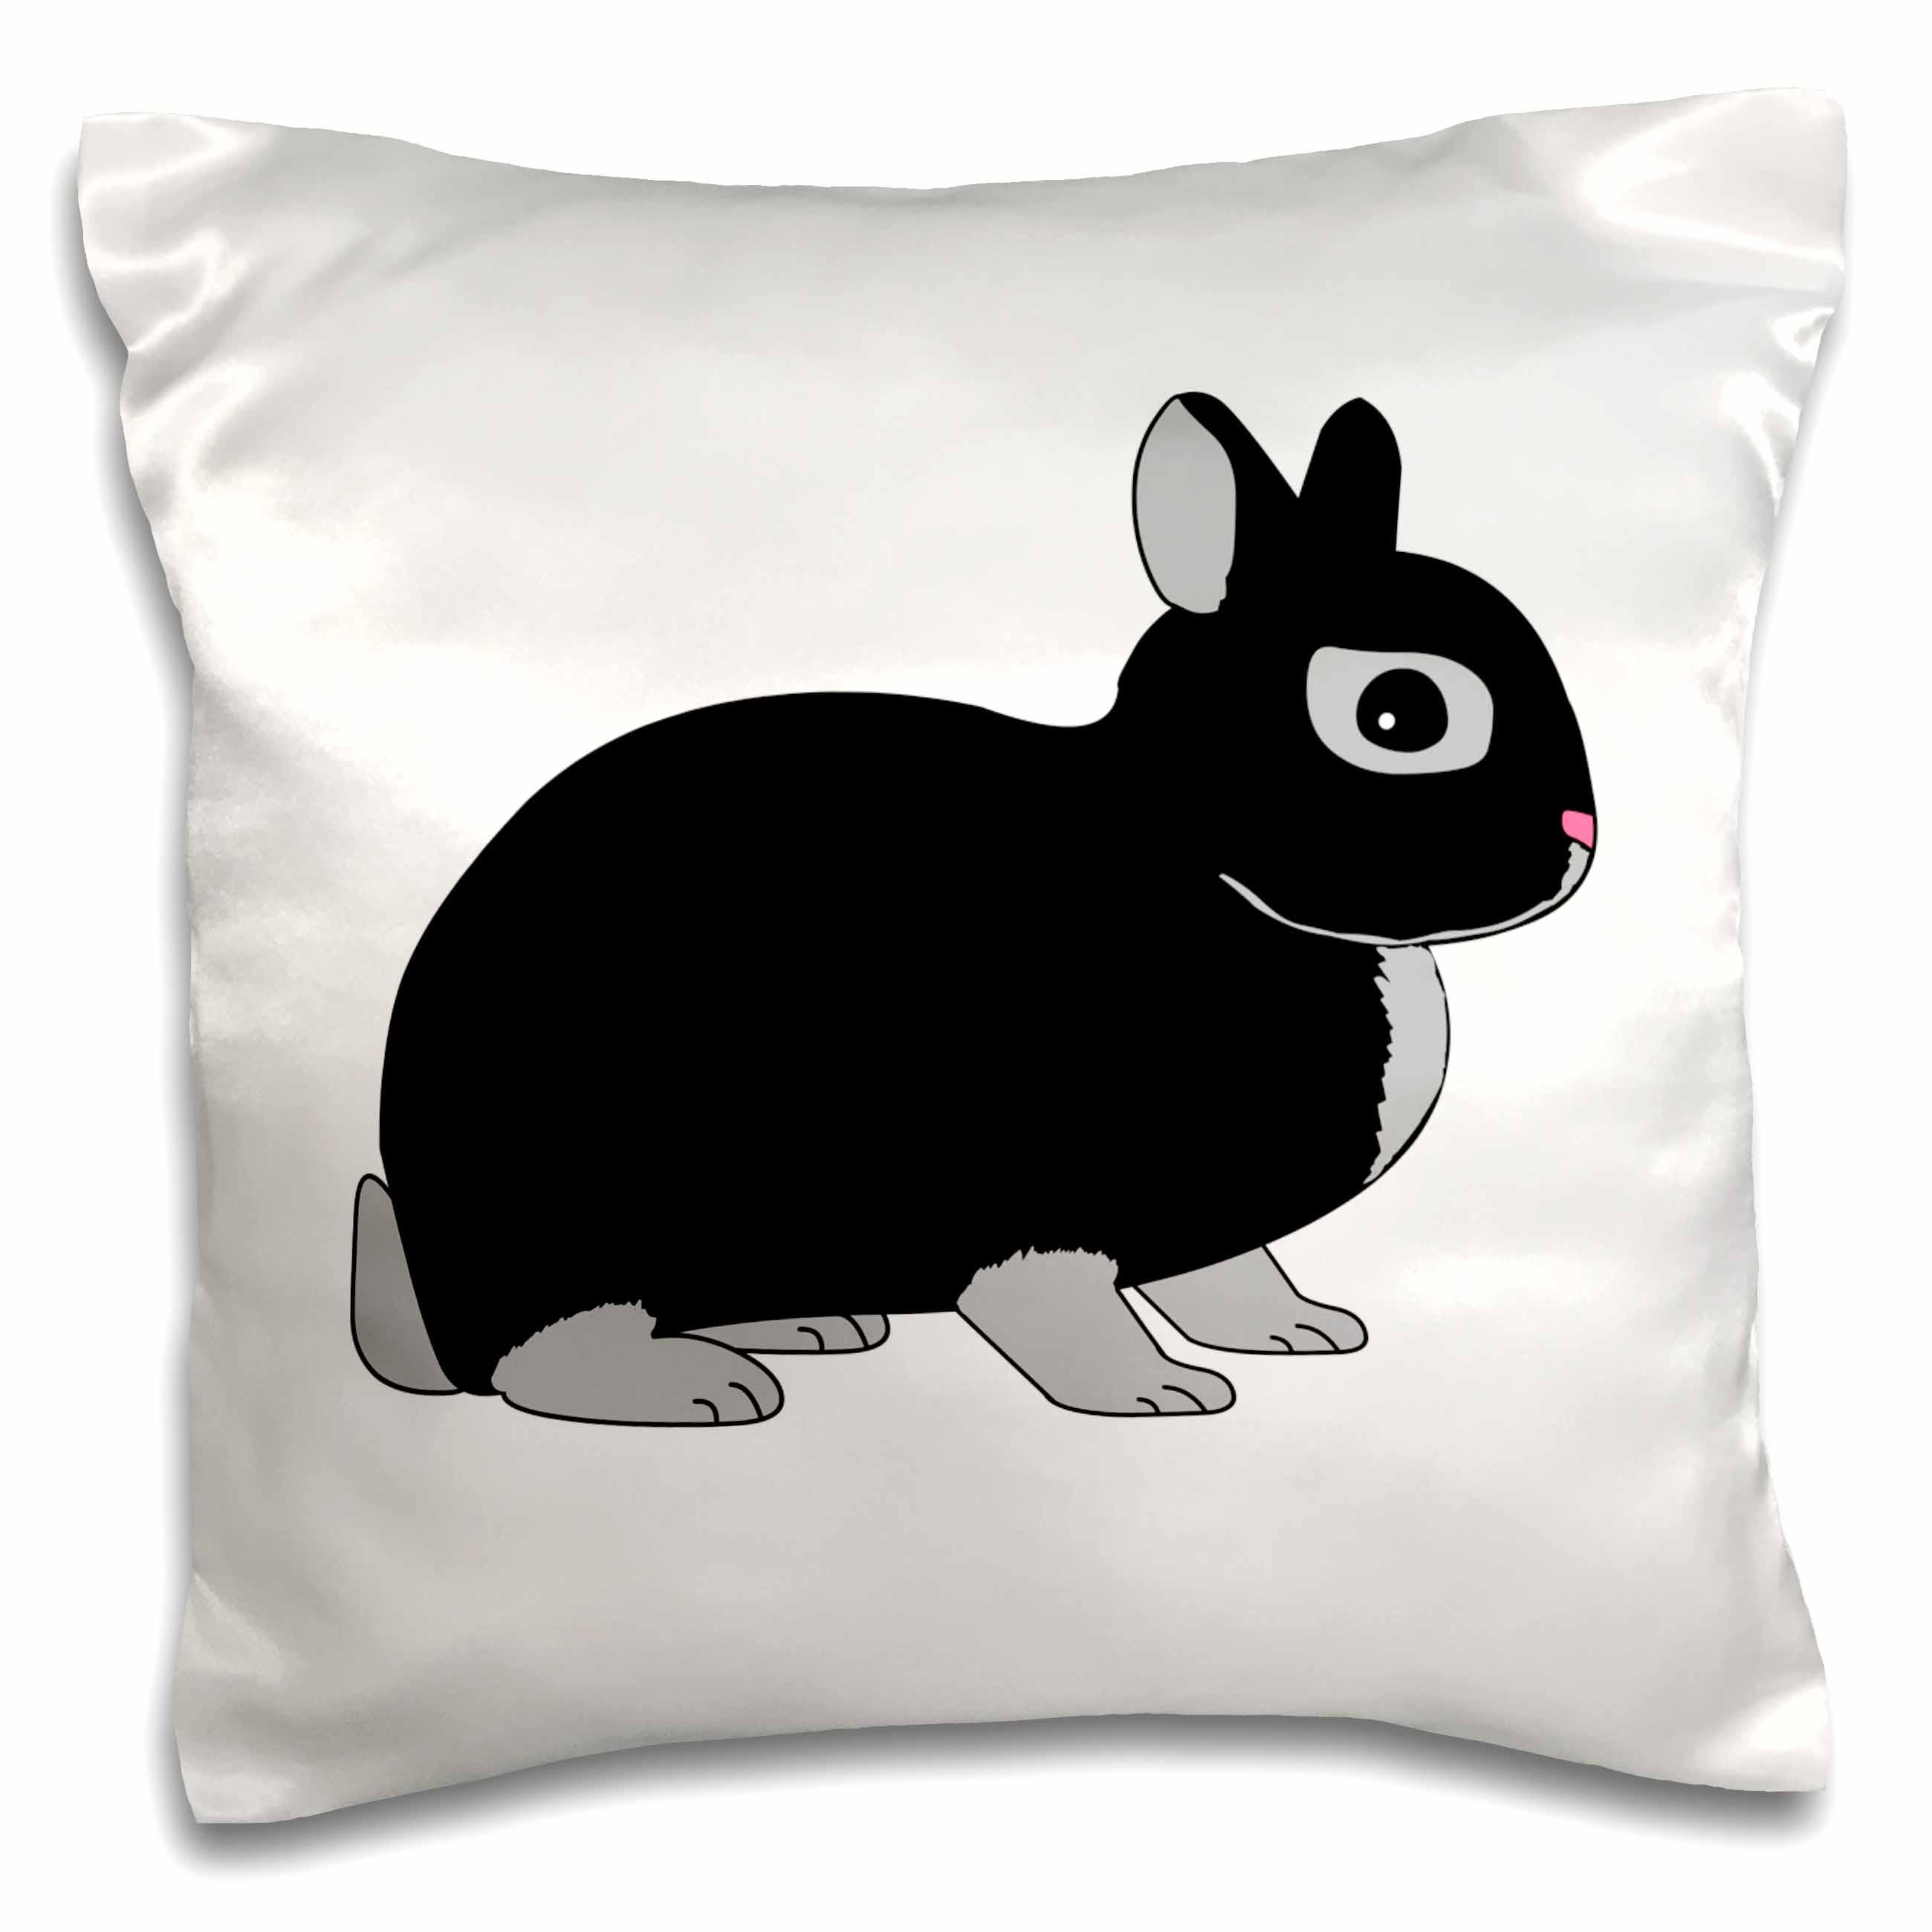 3dRose Netherland Dwarf Rabbit Silver Marten Design, Pillow Case, 16 by 16-inch